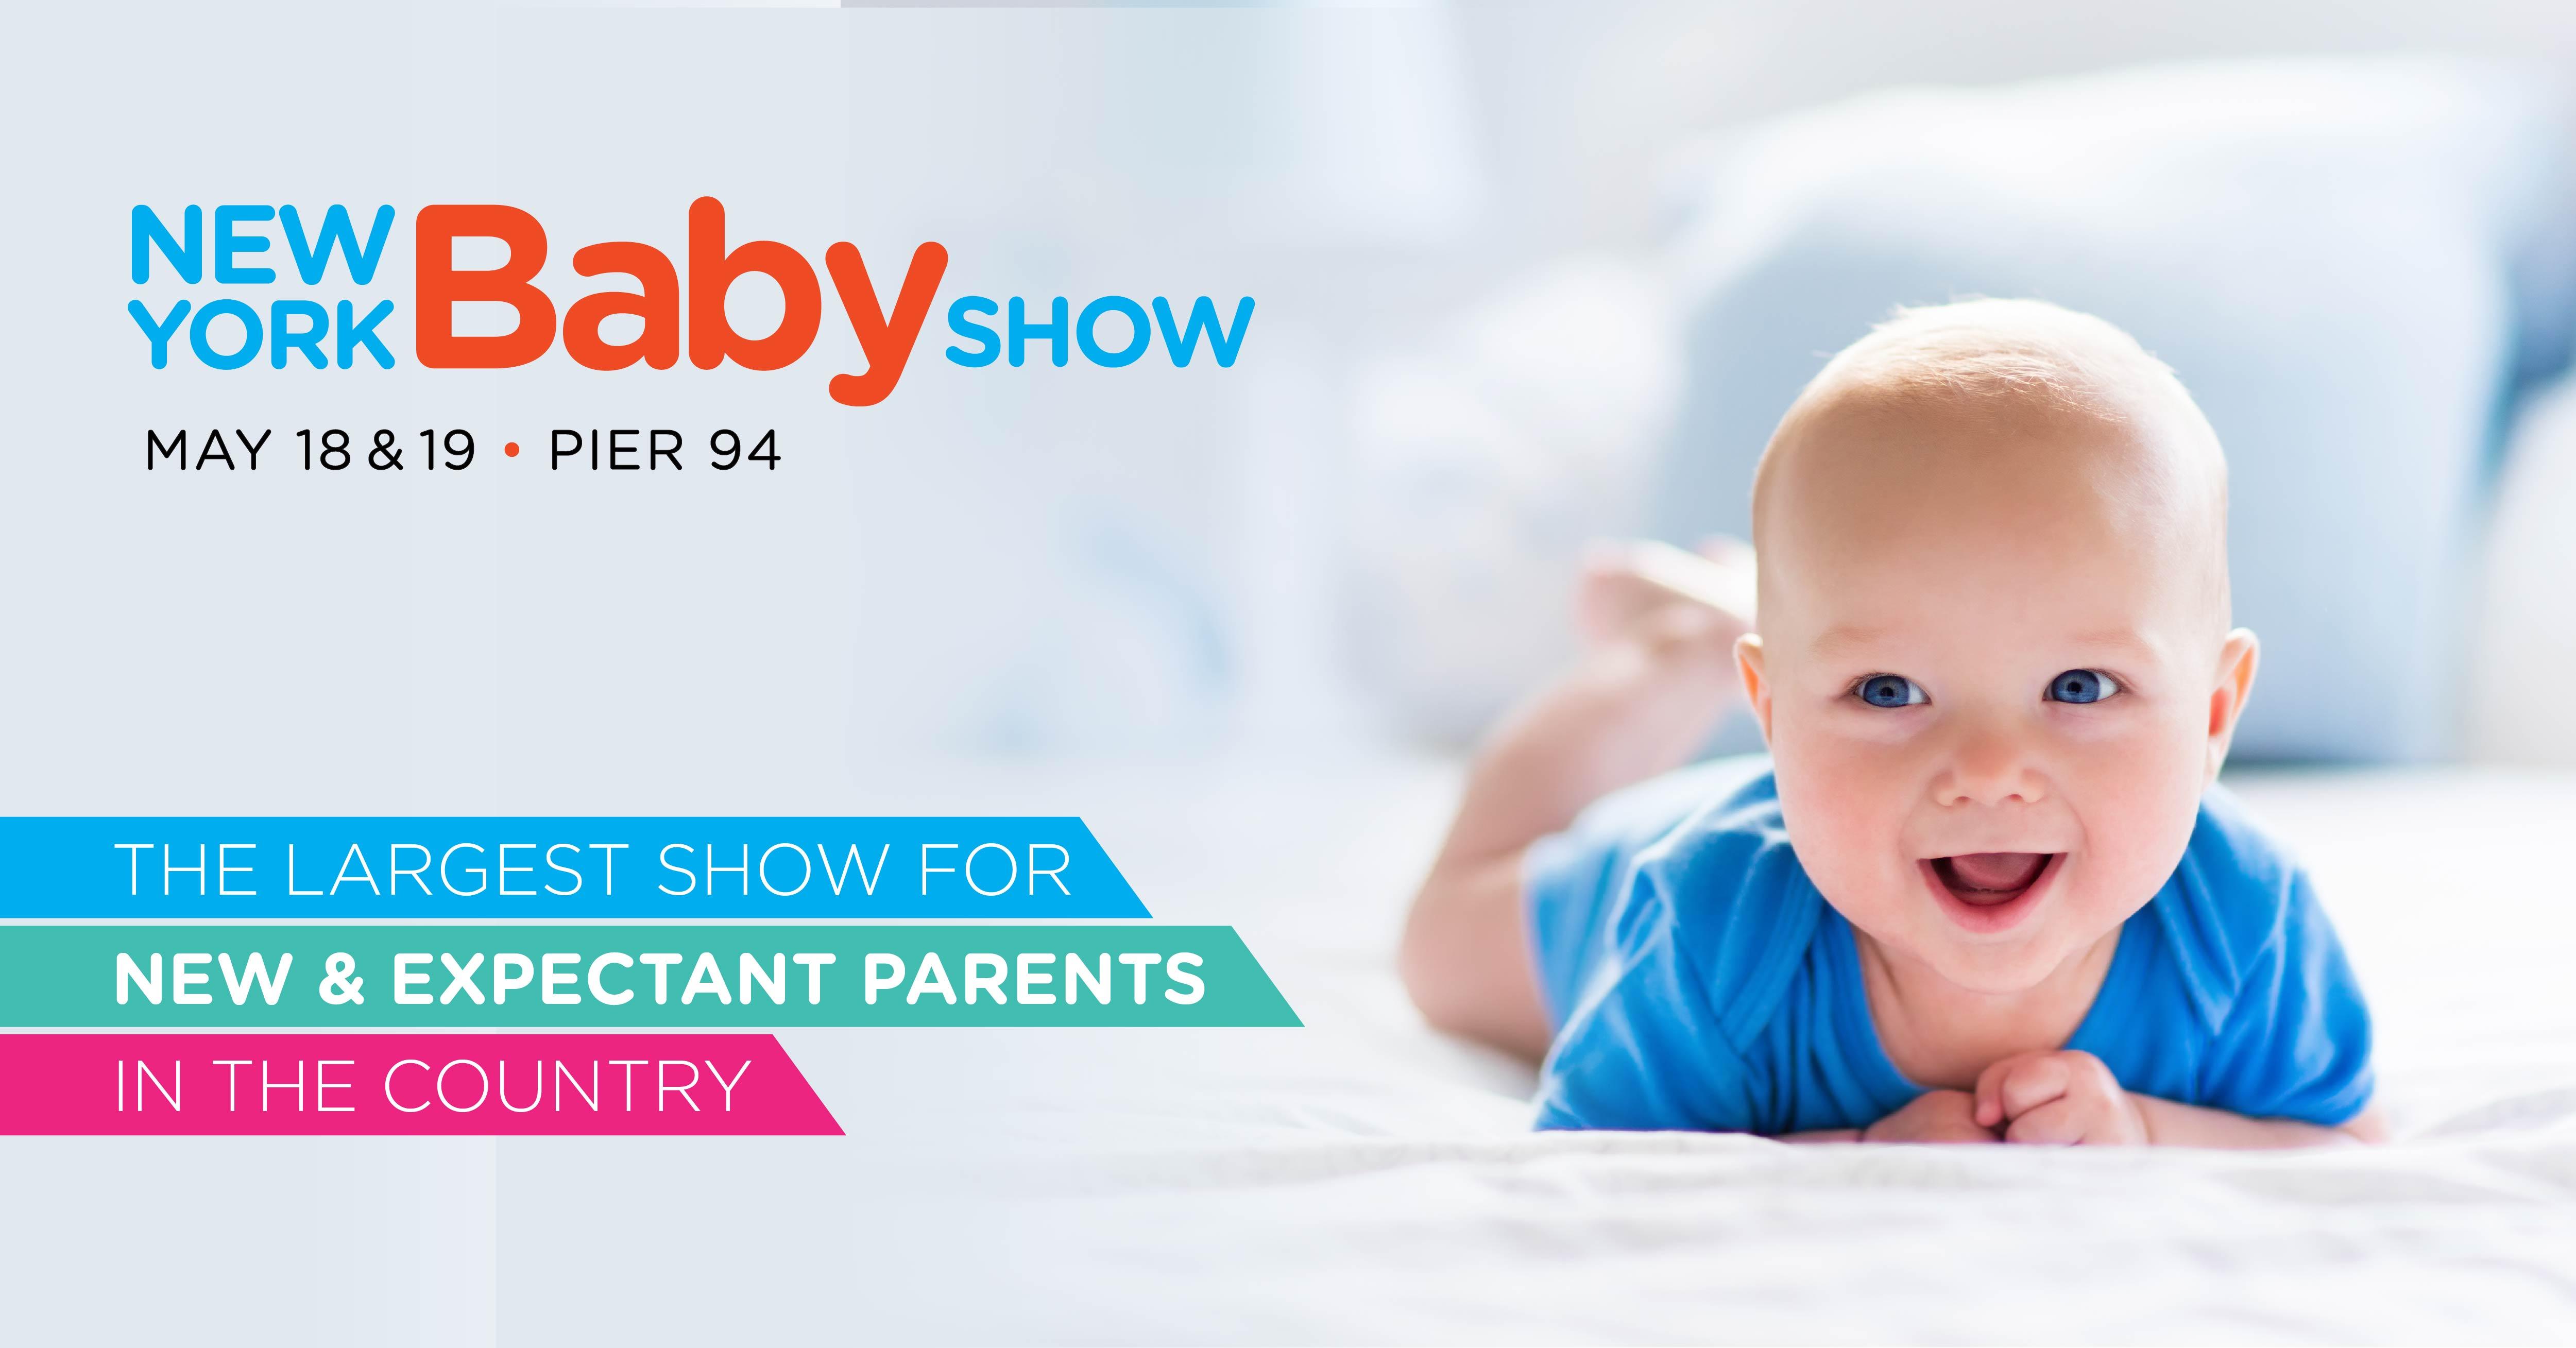 091c4c65c Tickets - The New York Baby Show